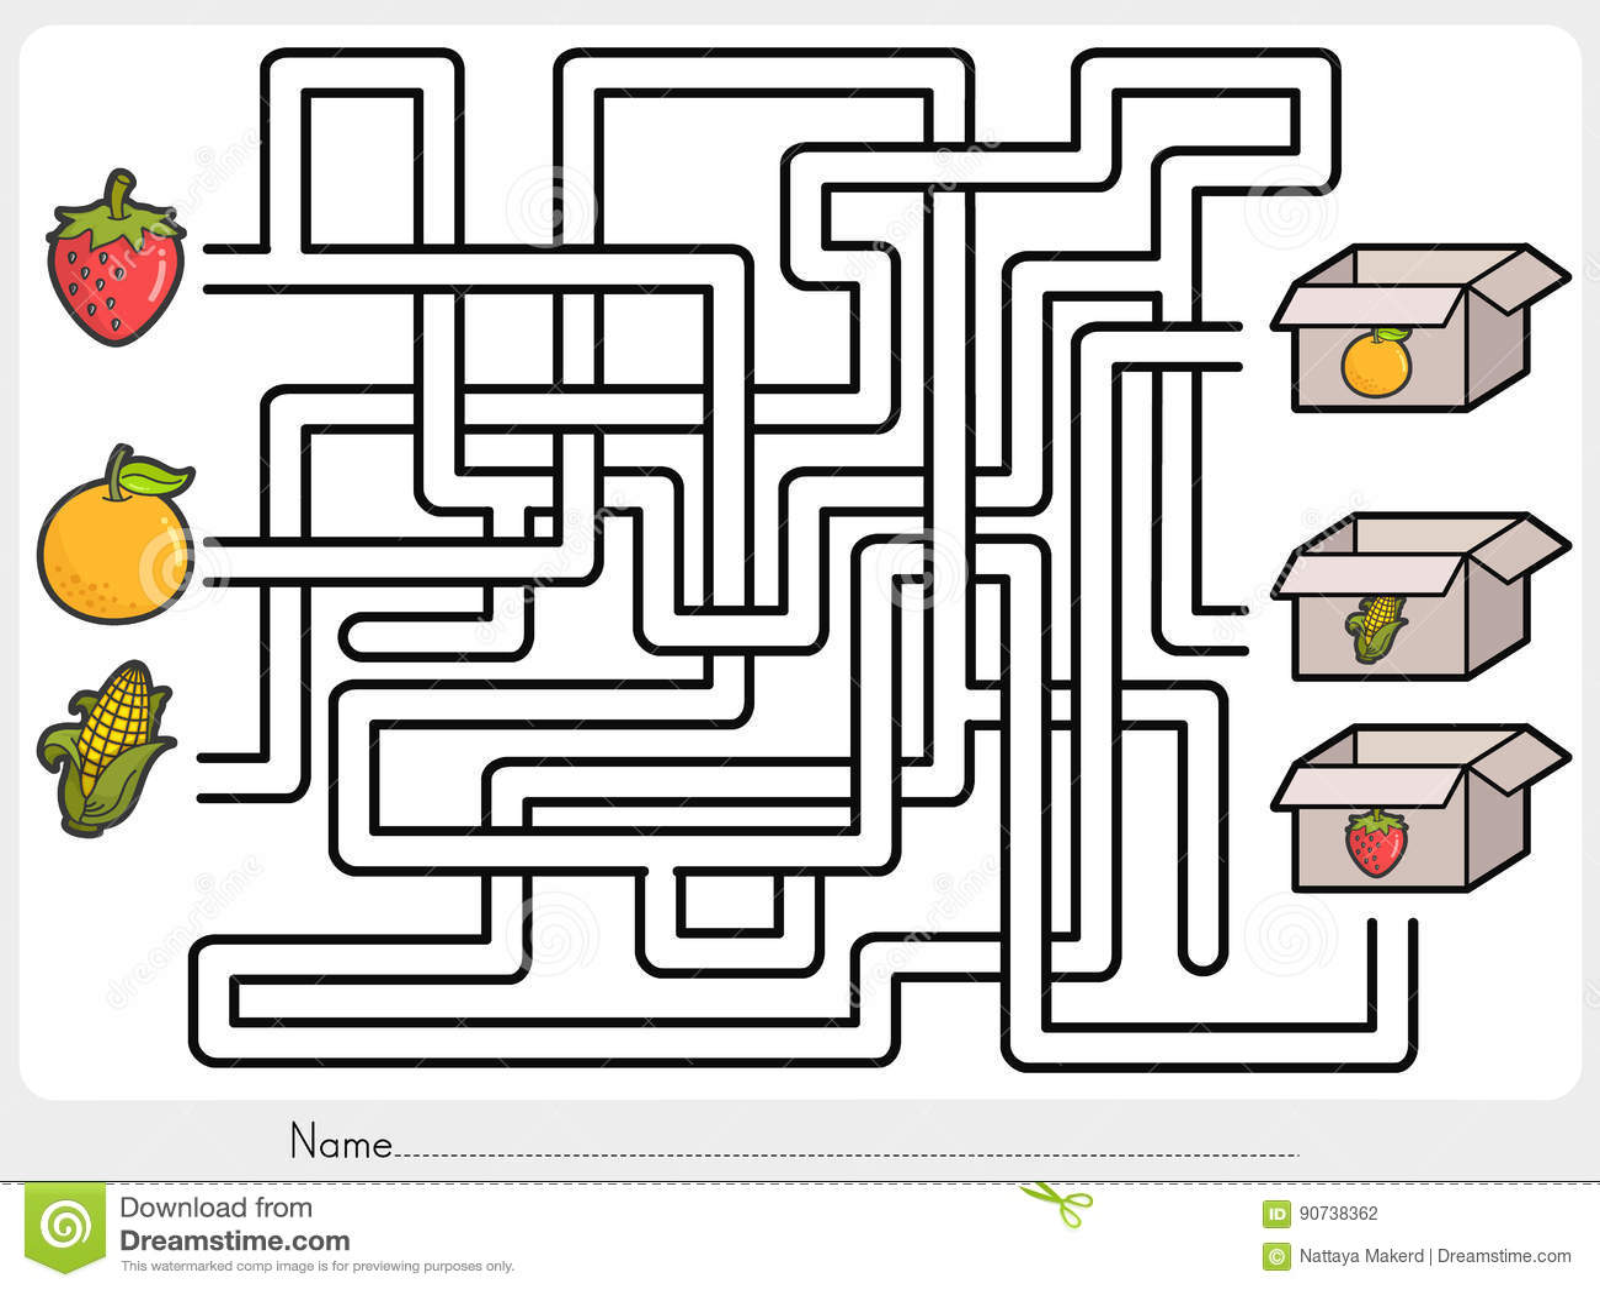 Maze Game Pick Fruits Box